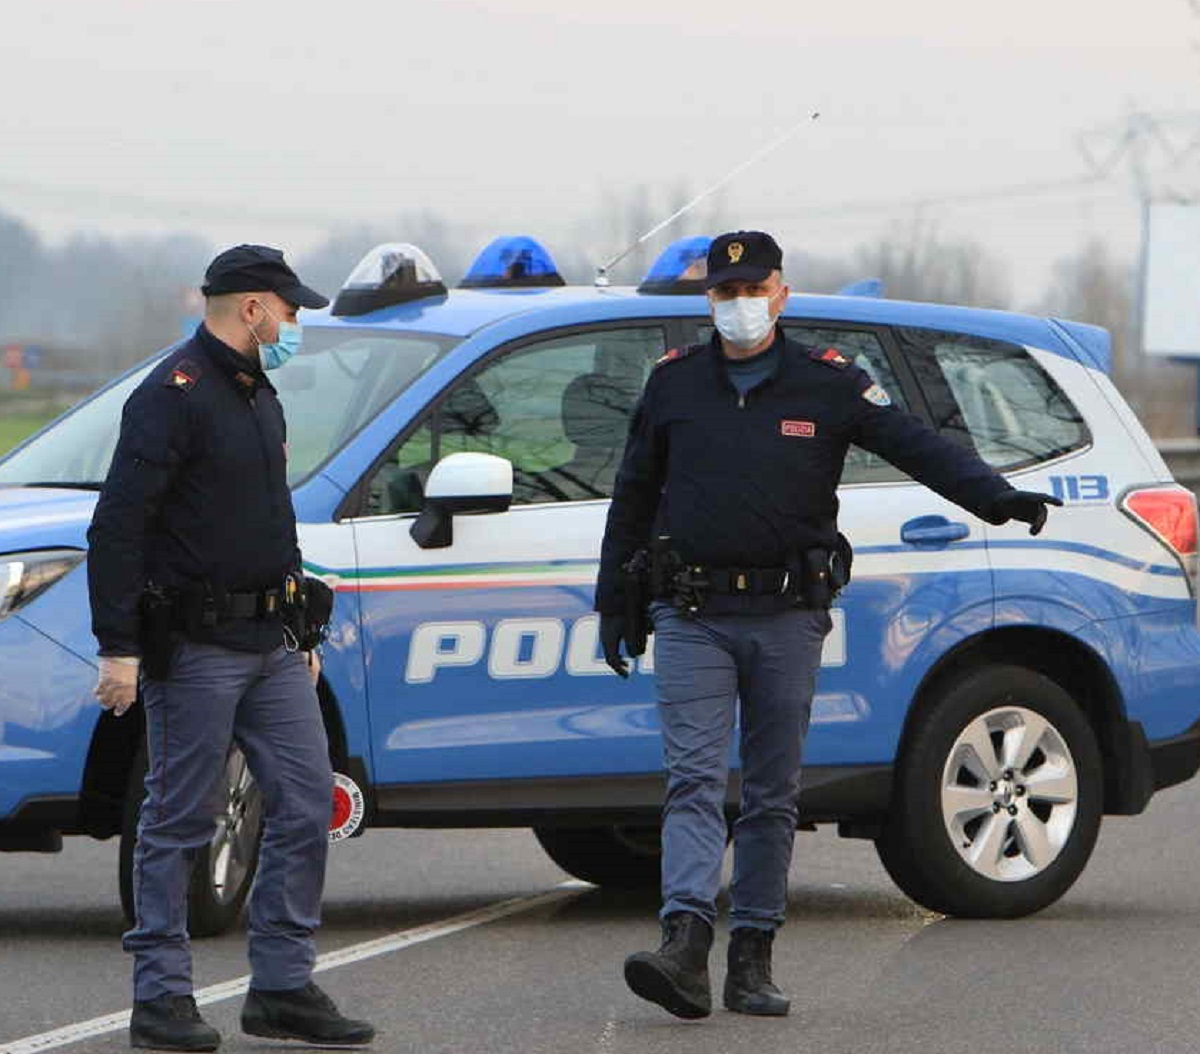 Villamassargia lockdown zona rossa misure restrittive